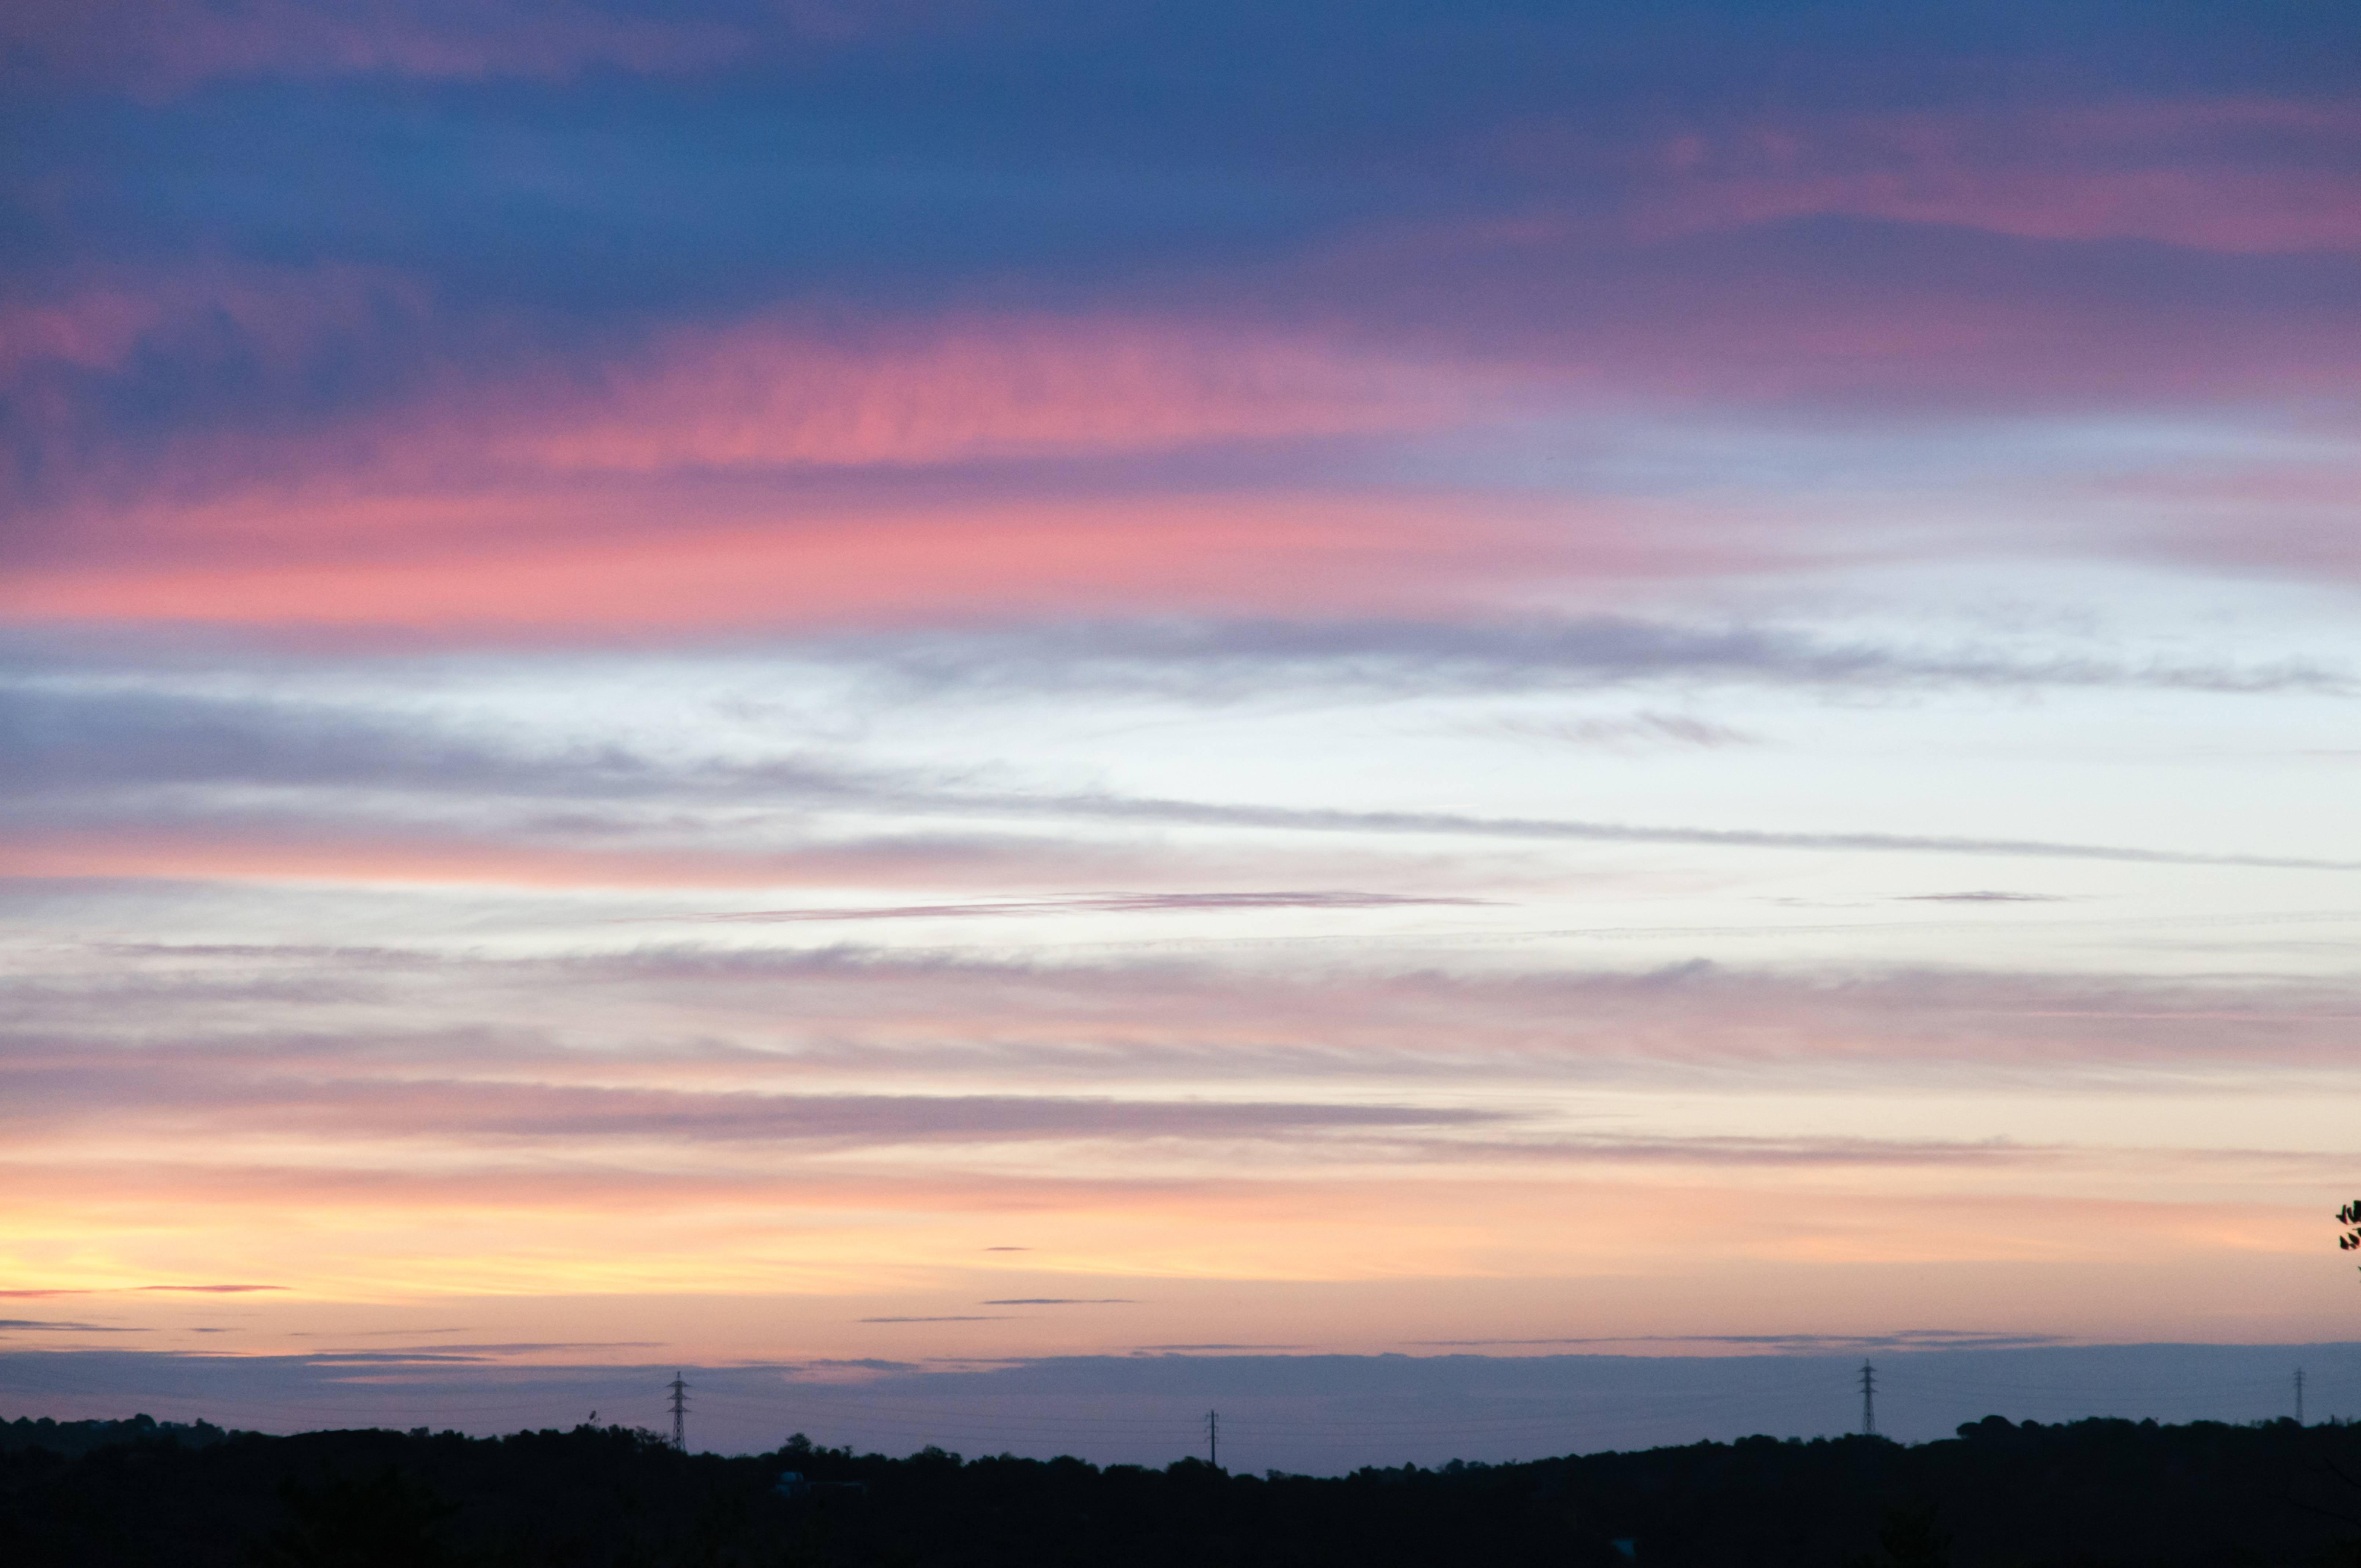 Colourfull sky cloudy sunset